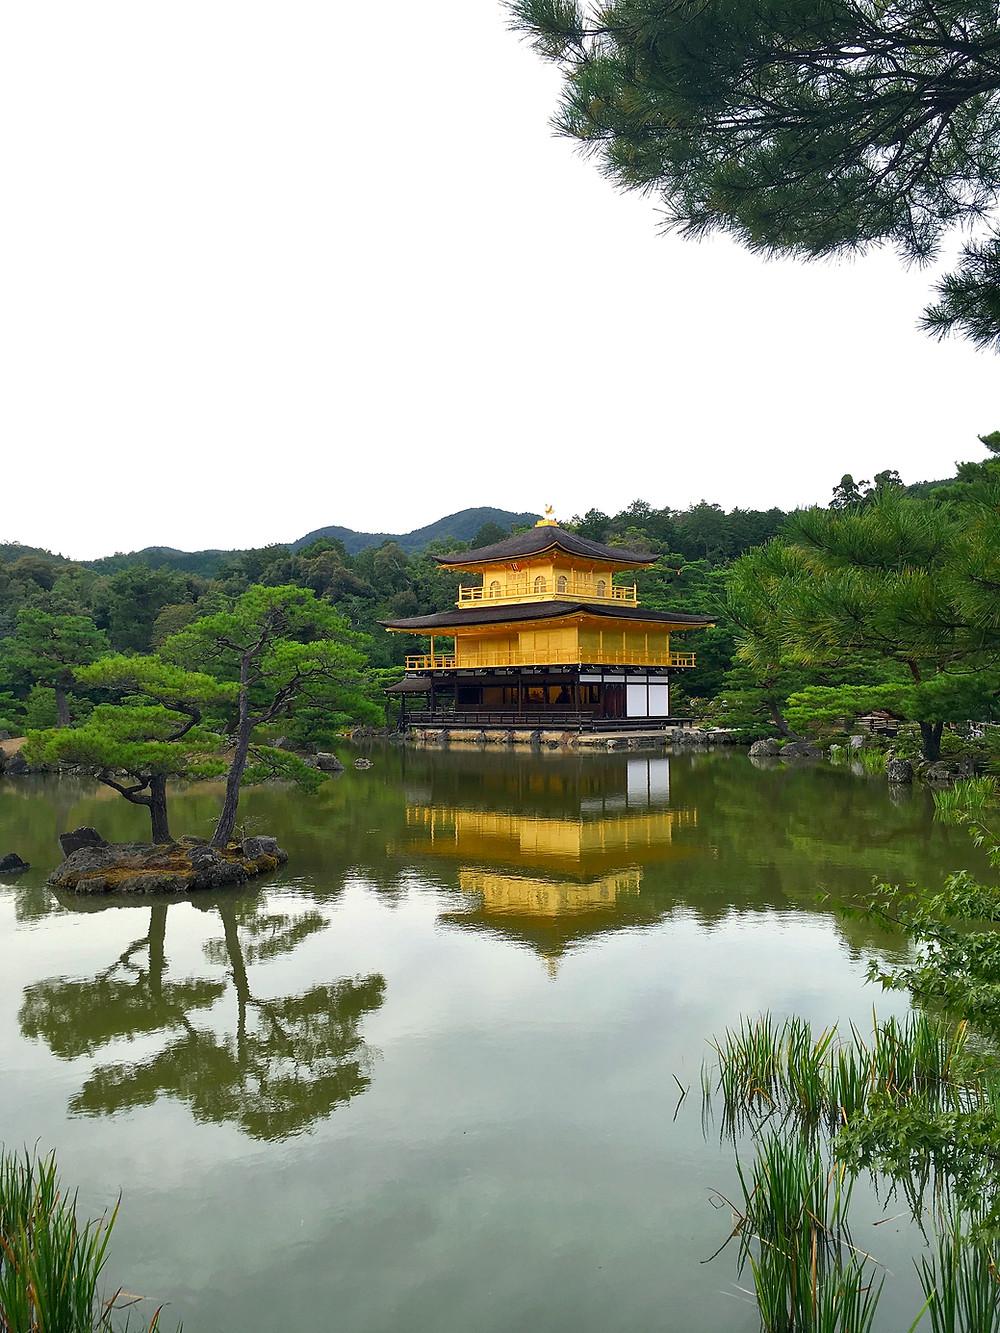 Kinkaku-ji Temple in Kyoto Japan